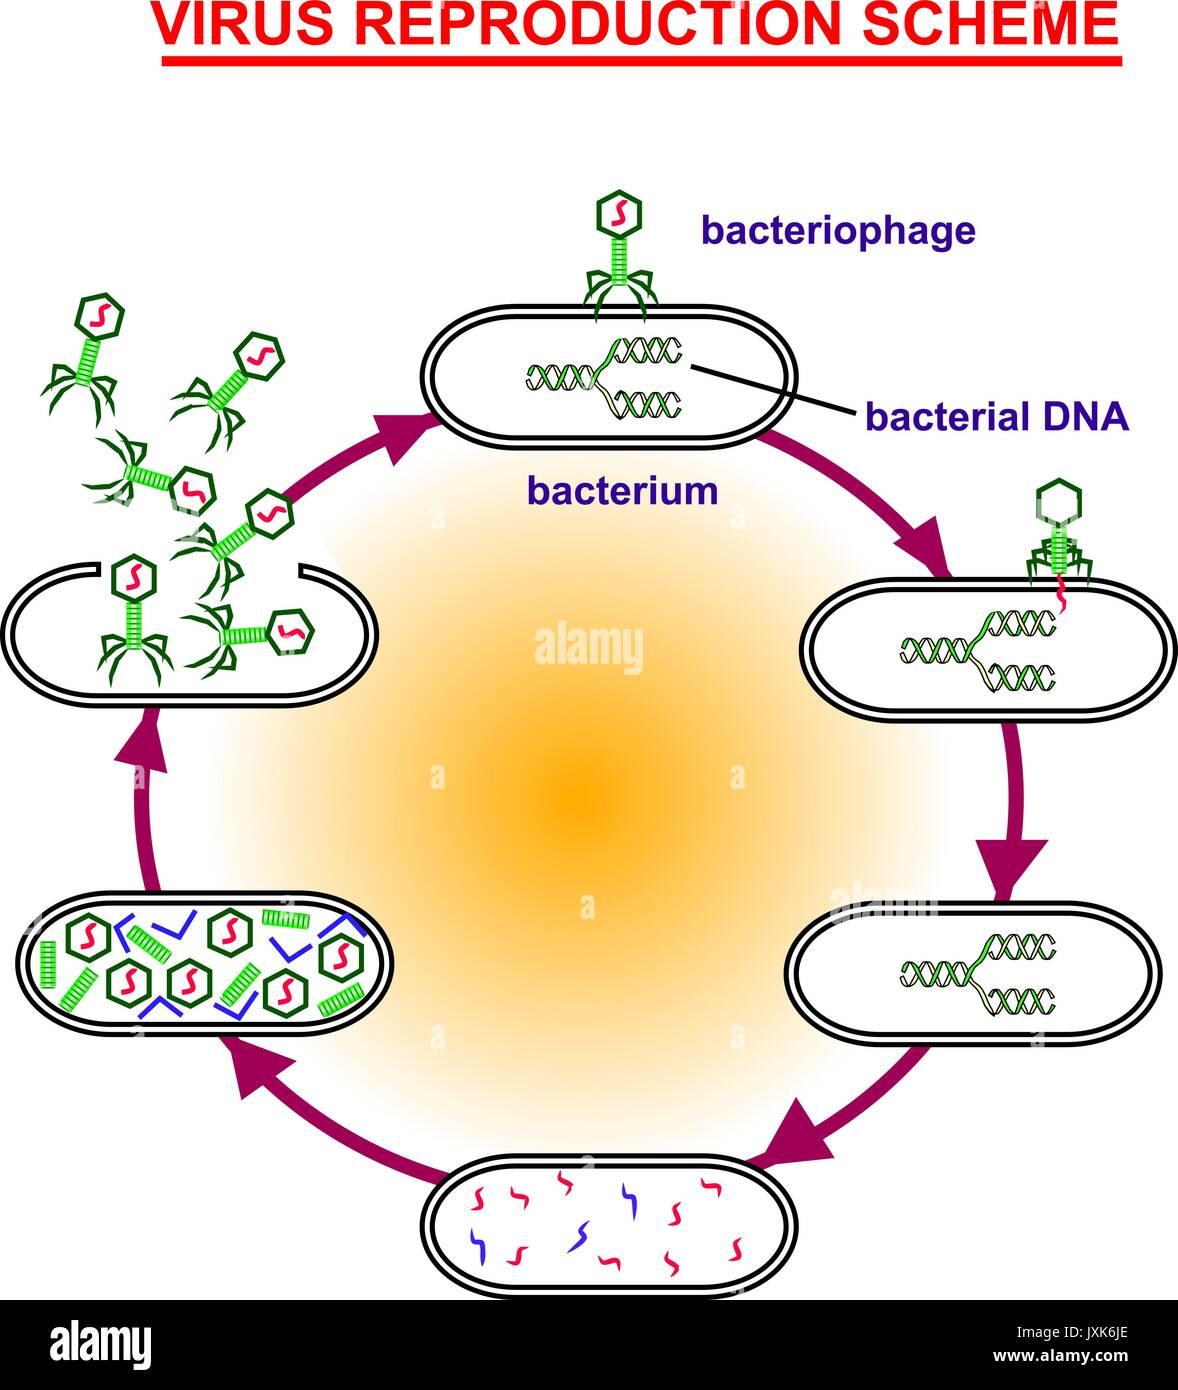 virus reproduction scheme - Stock Vector